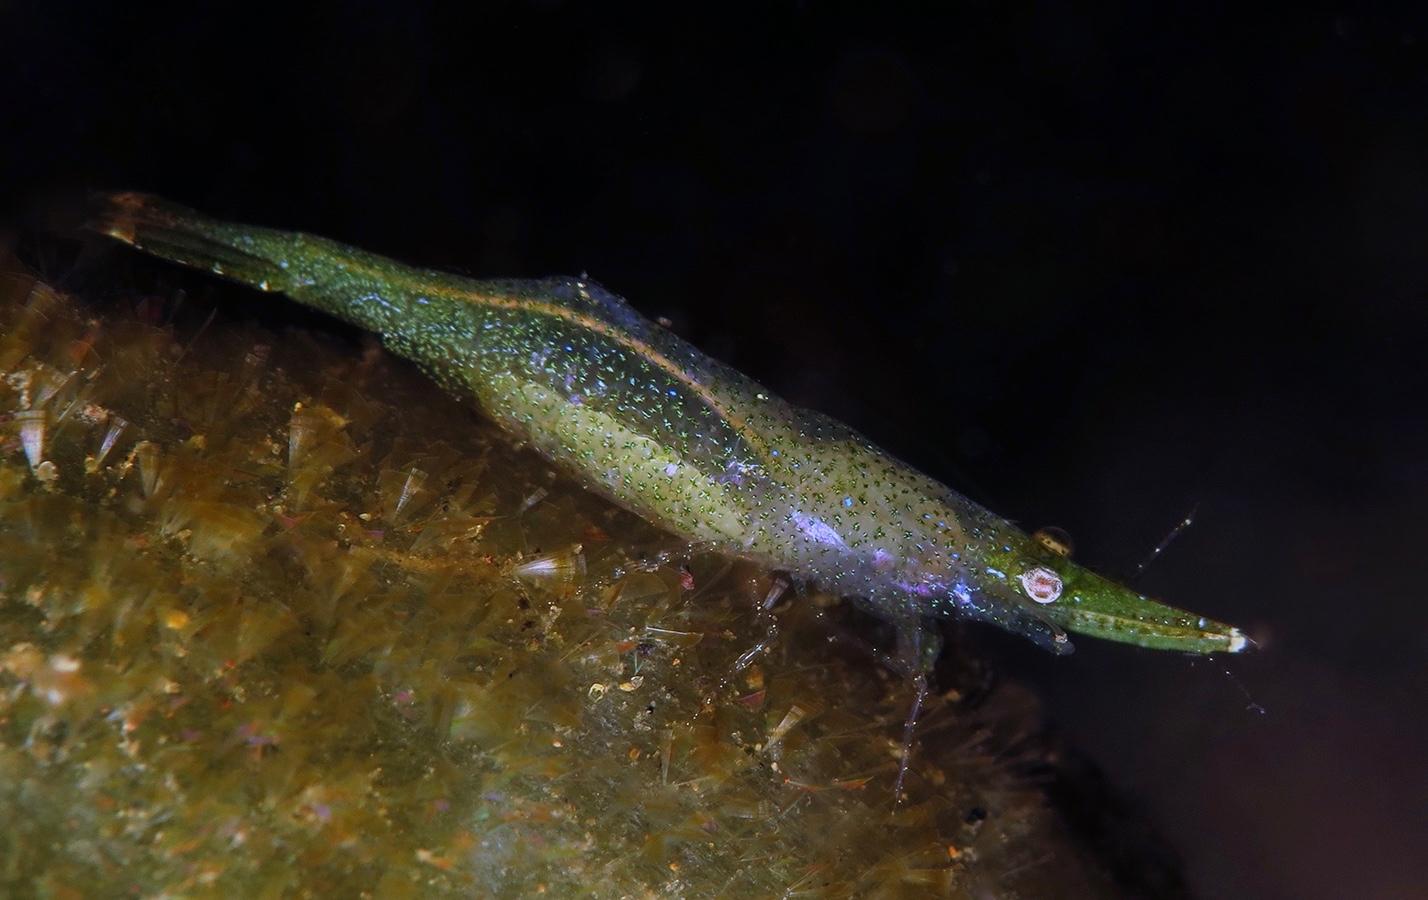 Latreutes pymoeus     巴厘岛艾湄湾 Amed Bay 印度尼西亚 Indonesia @lazydiving.com 潜水时光